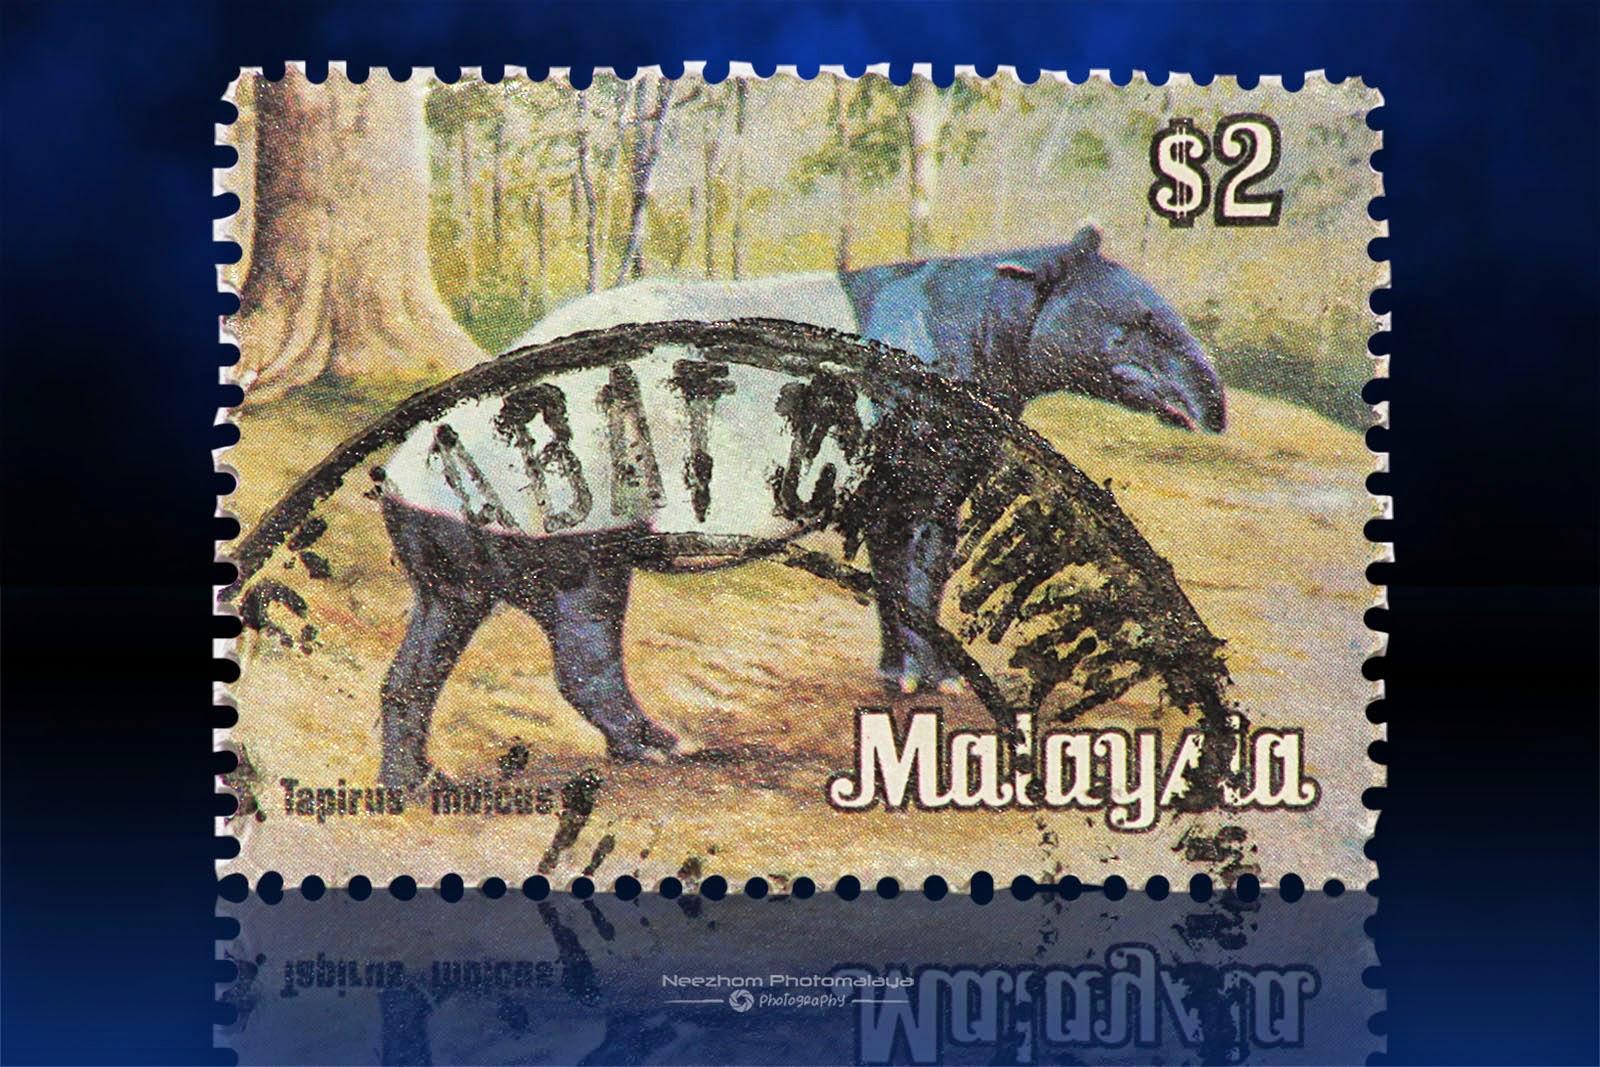 National Animals Series 1979 stamps - $2 Tapirus Indicus